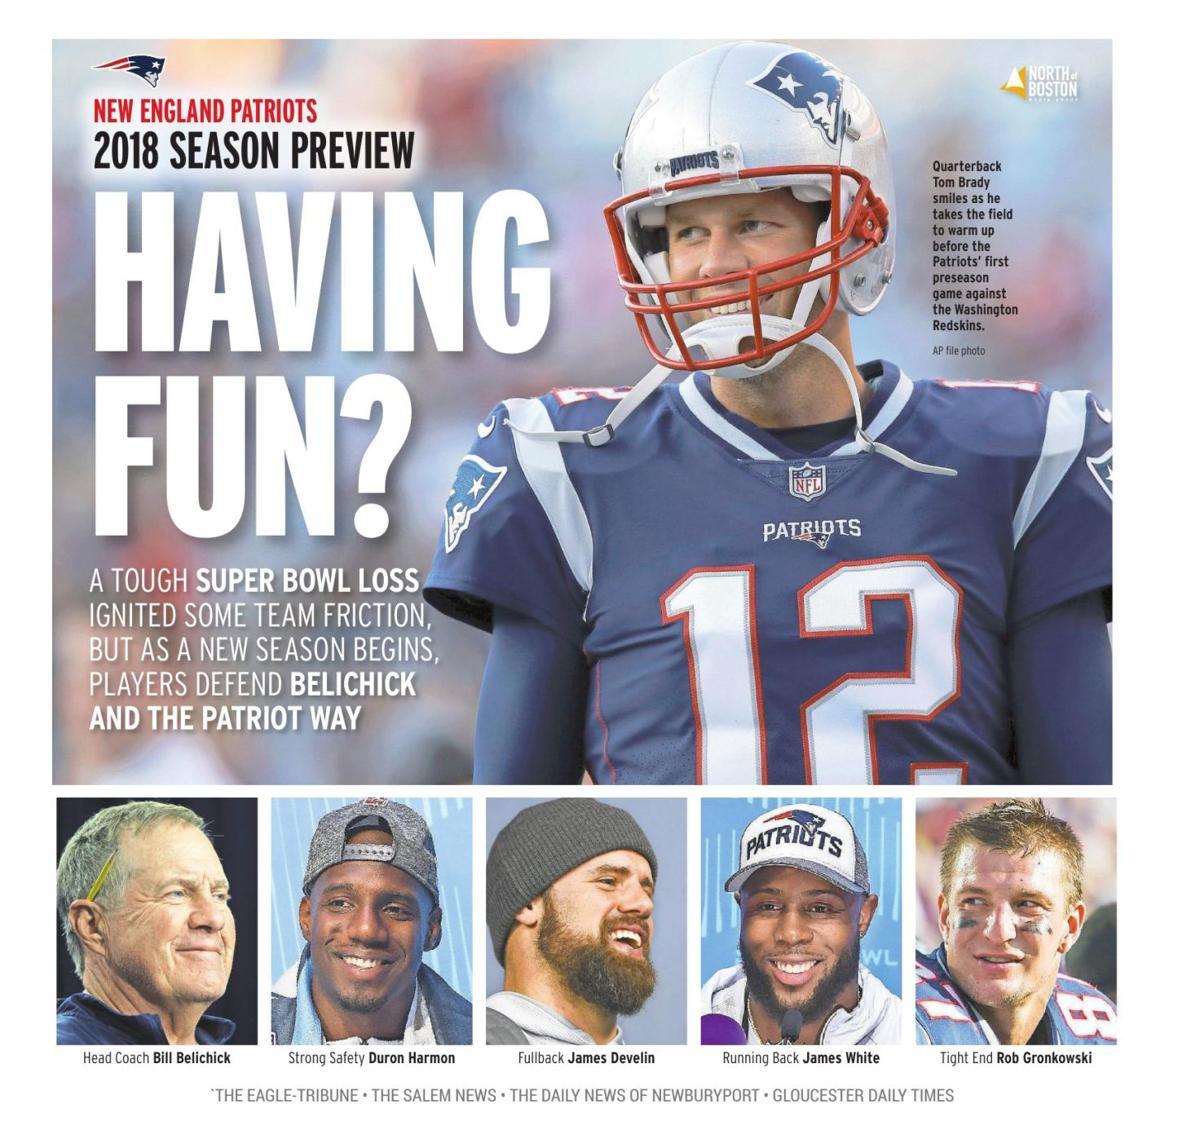 New England Patriots 2018 Season Preview